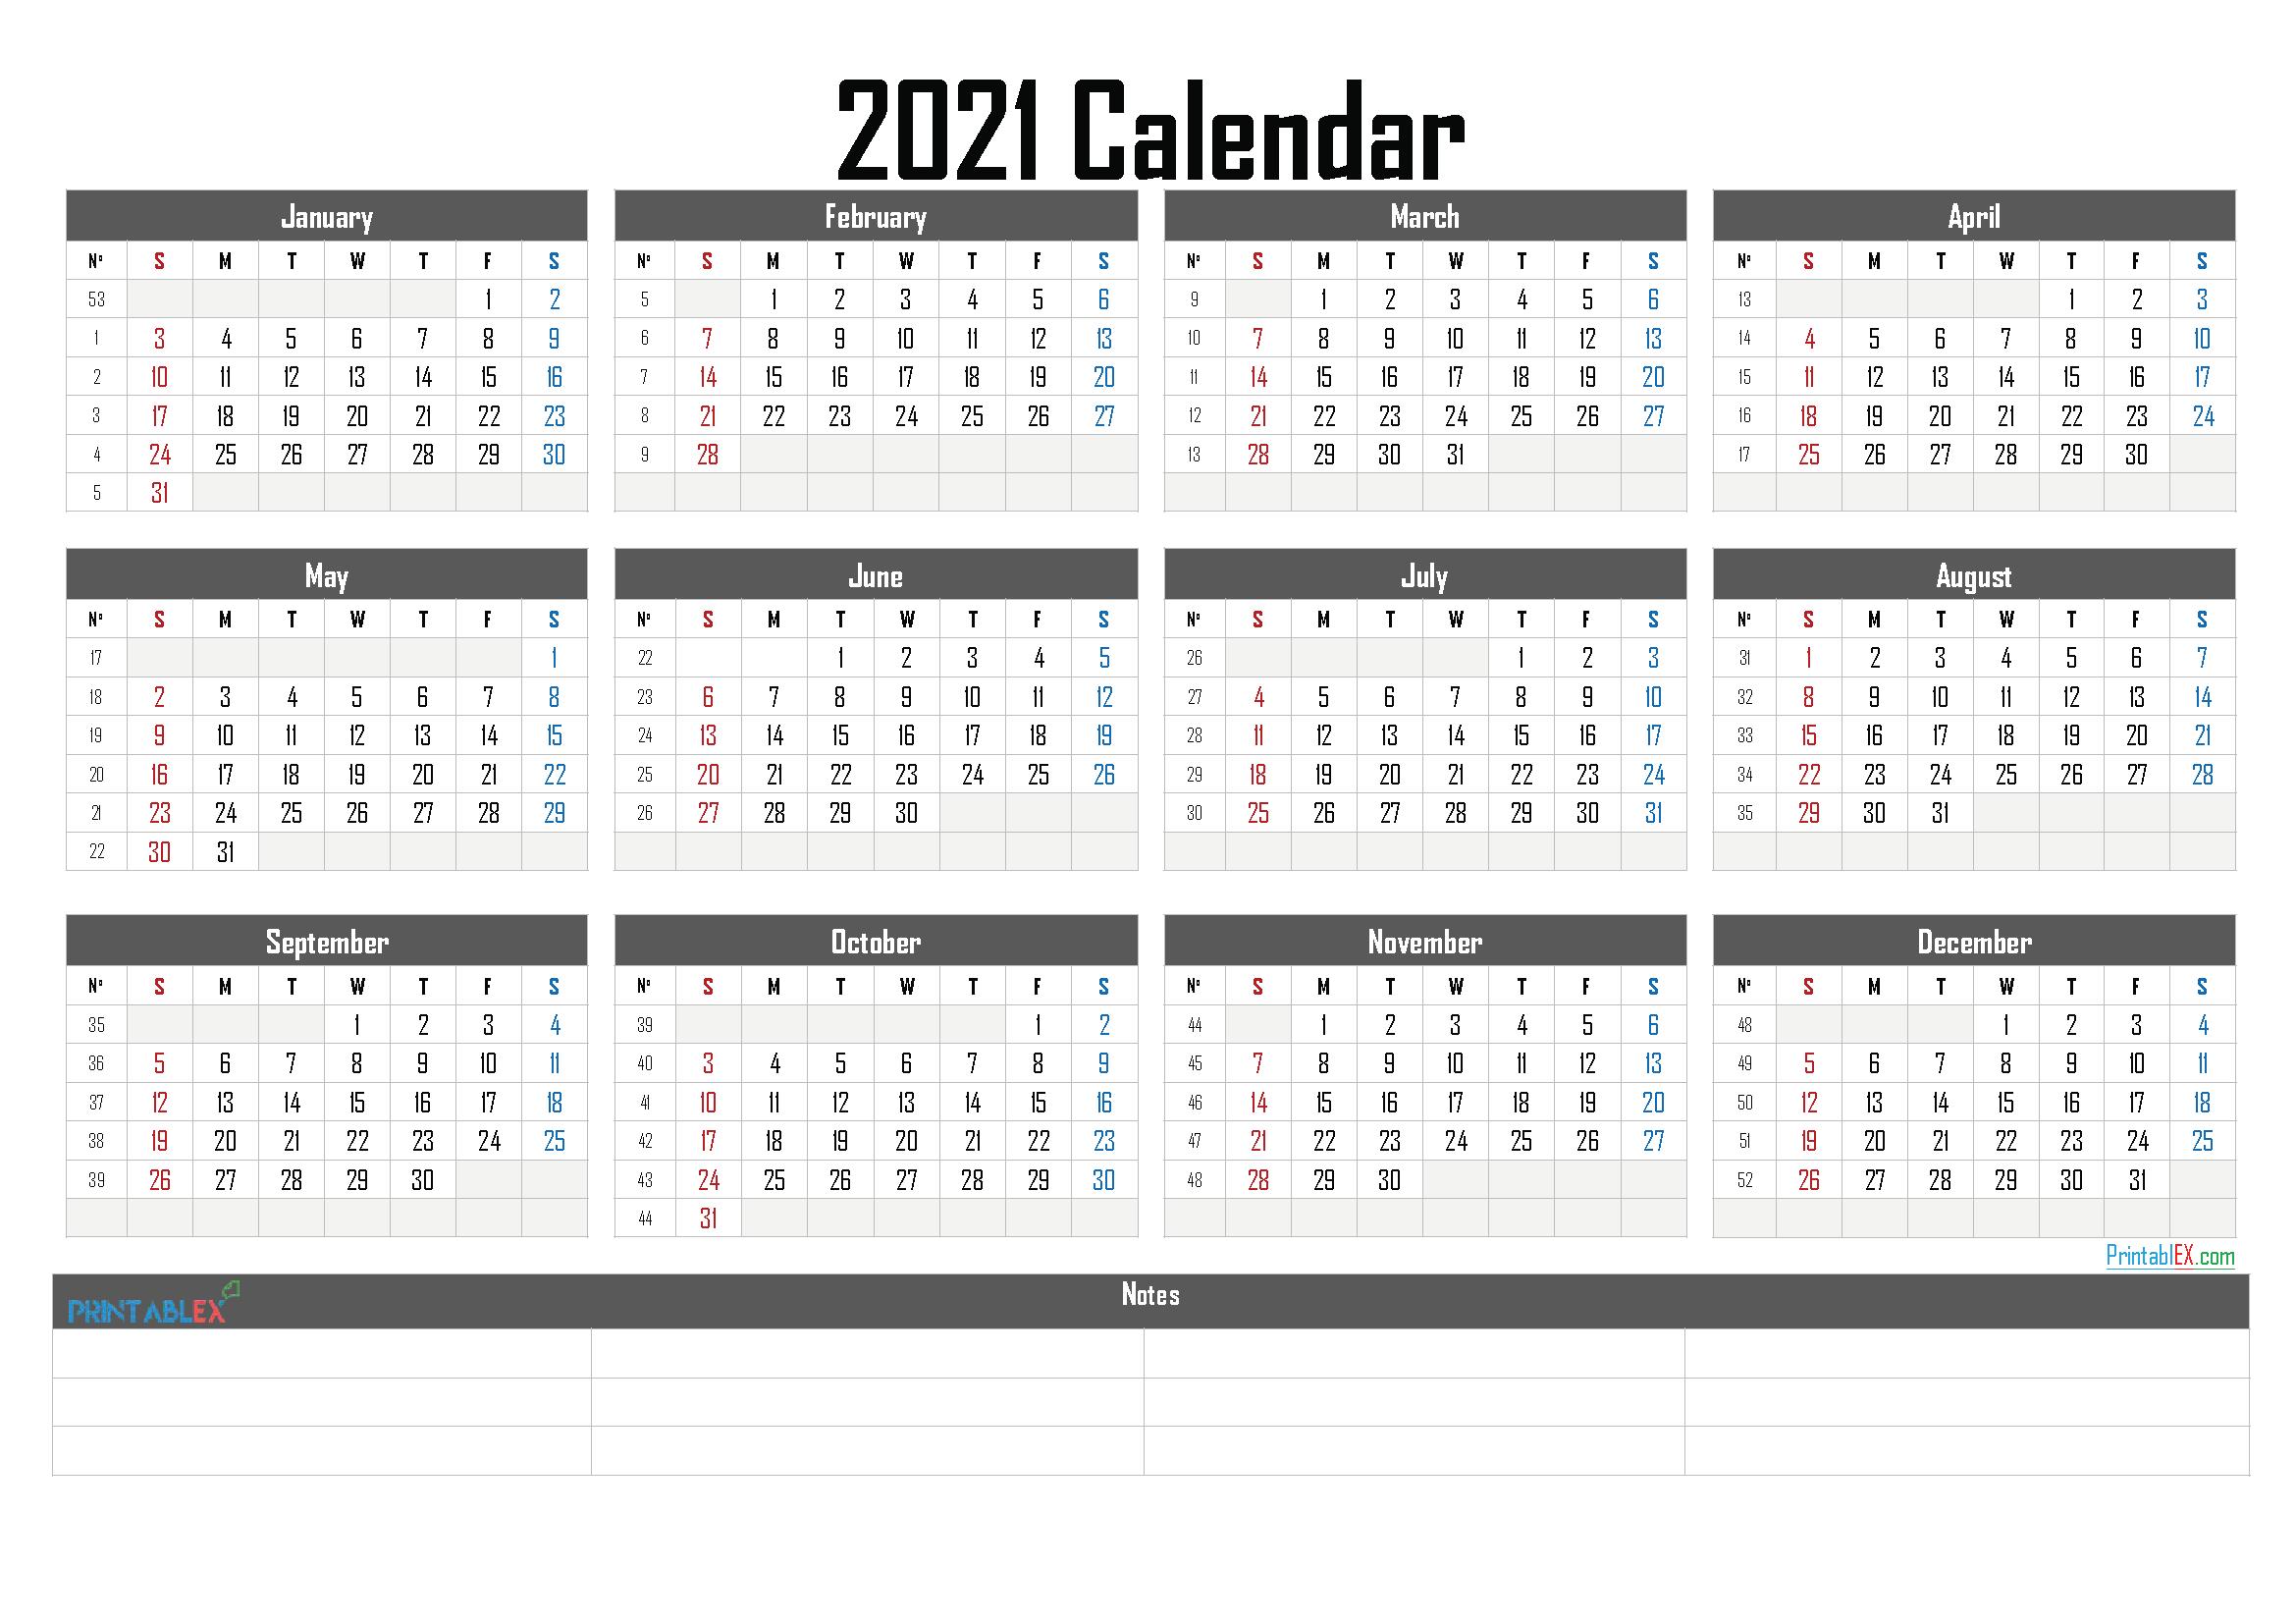 Free Printable Calendar Templates 2021 throughout Calendar Fill In 2021